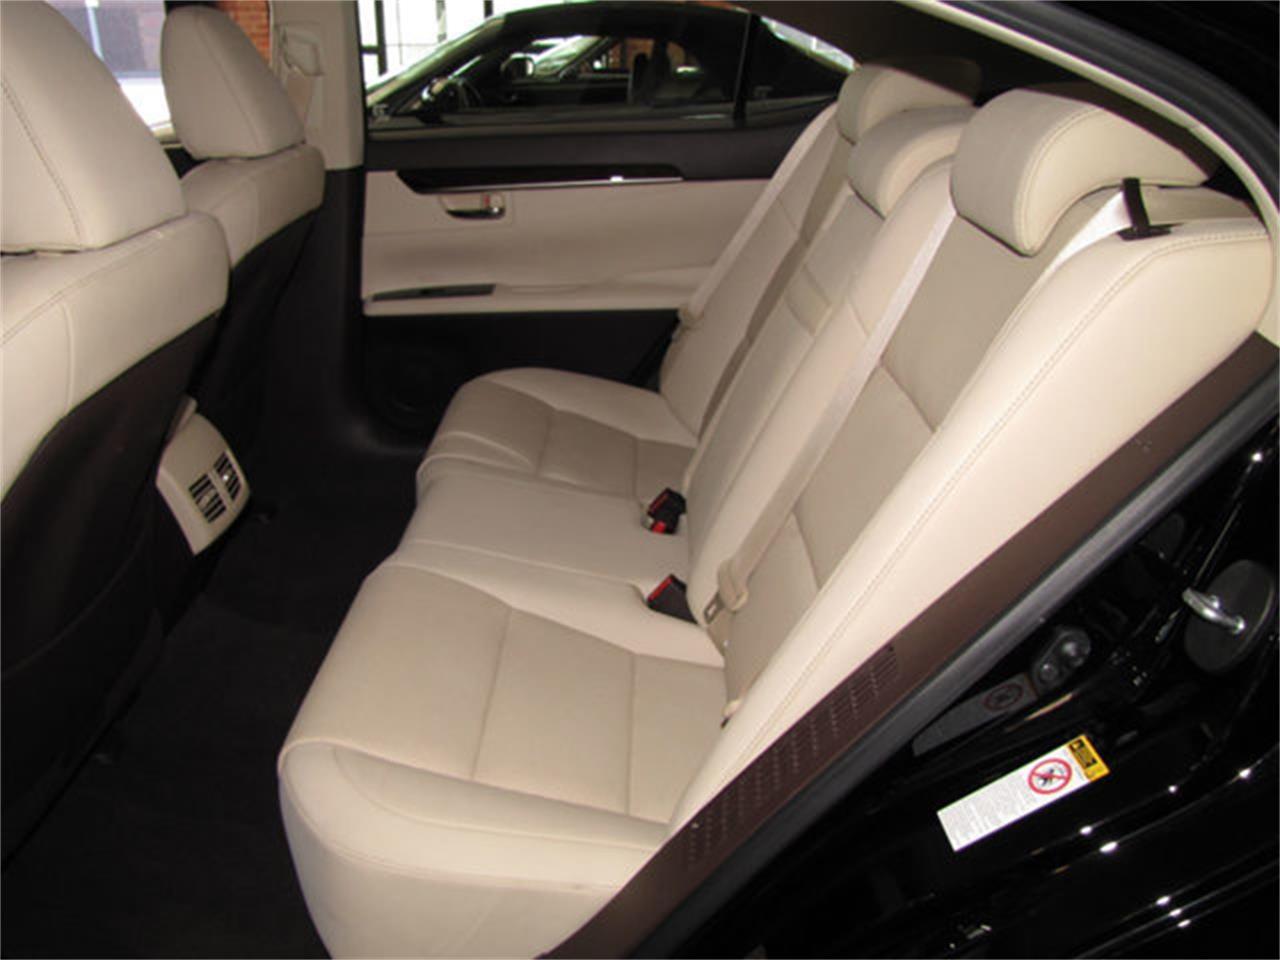 2016 Lexus ES300 (CC-1172704) for sale in Hollywood, California